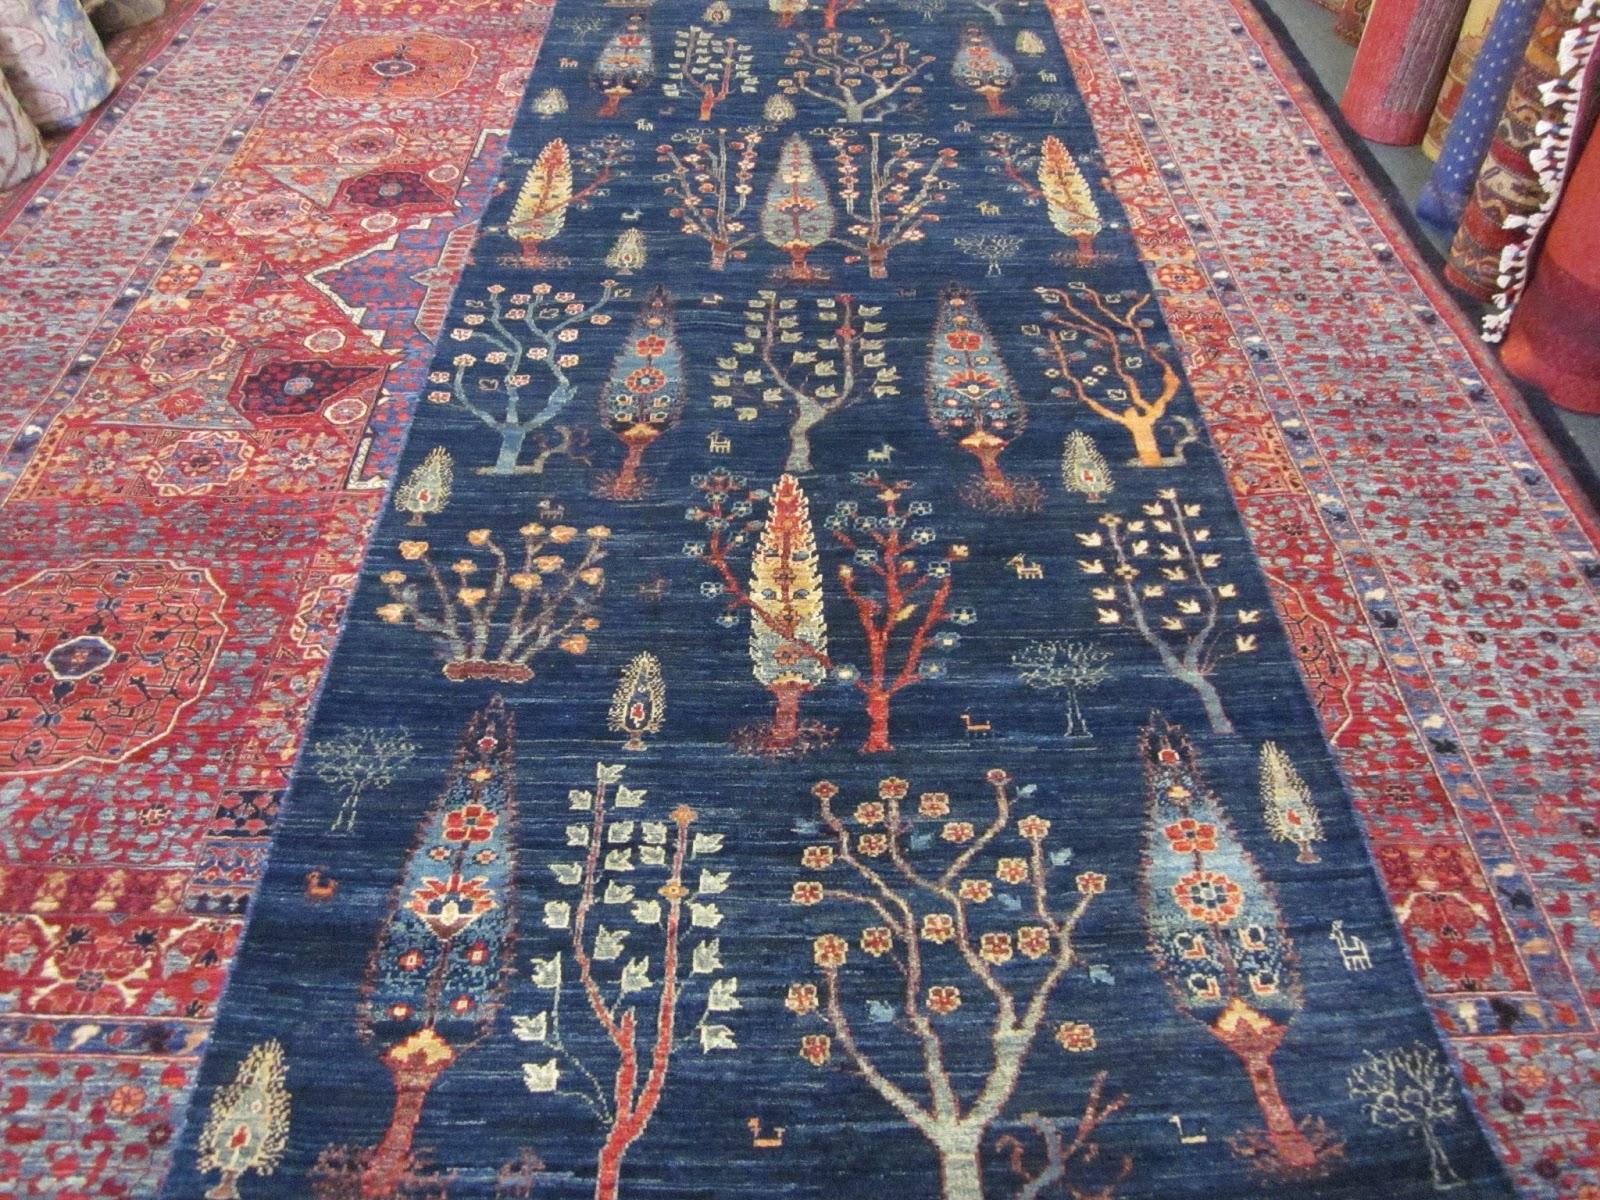 Many New Beautiful Handmade Afghan Rugs